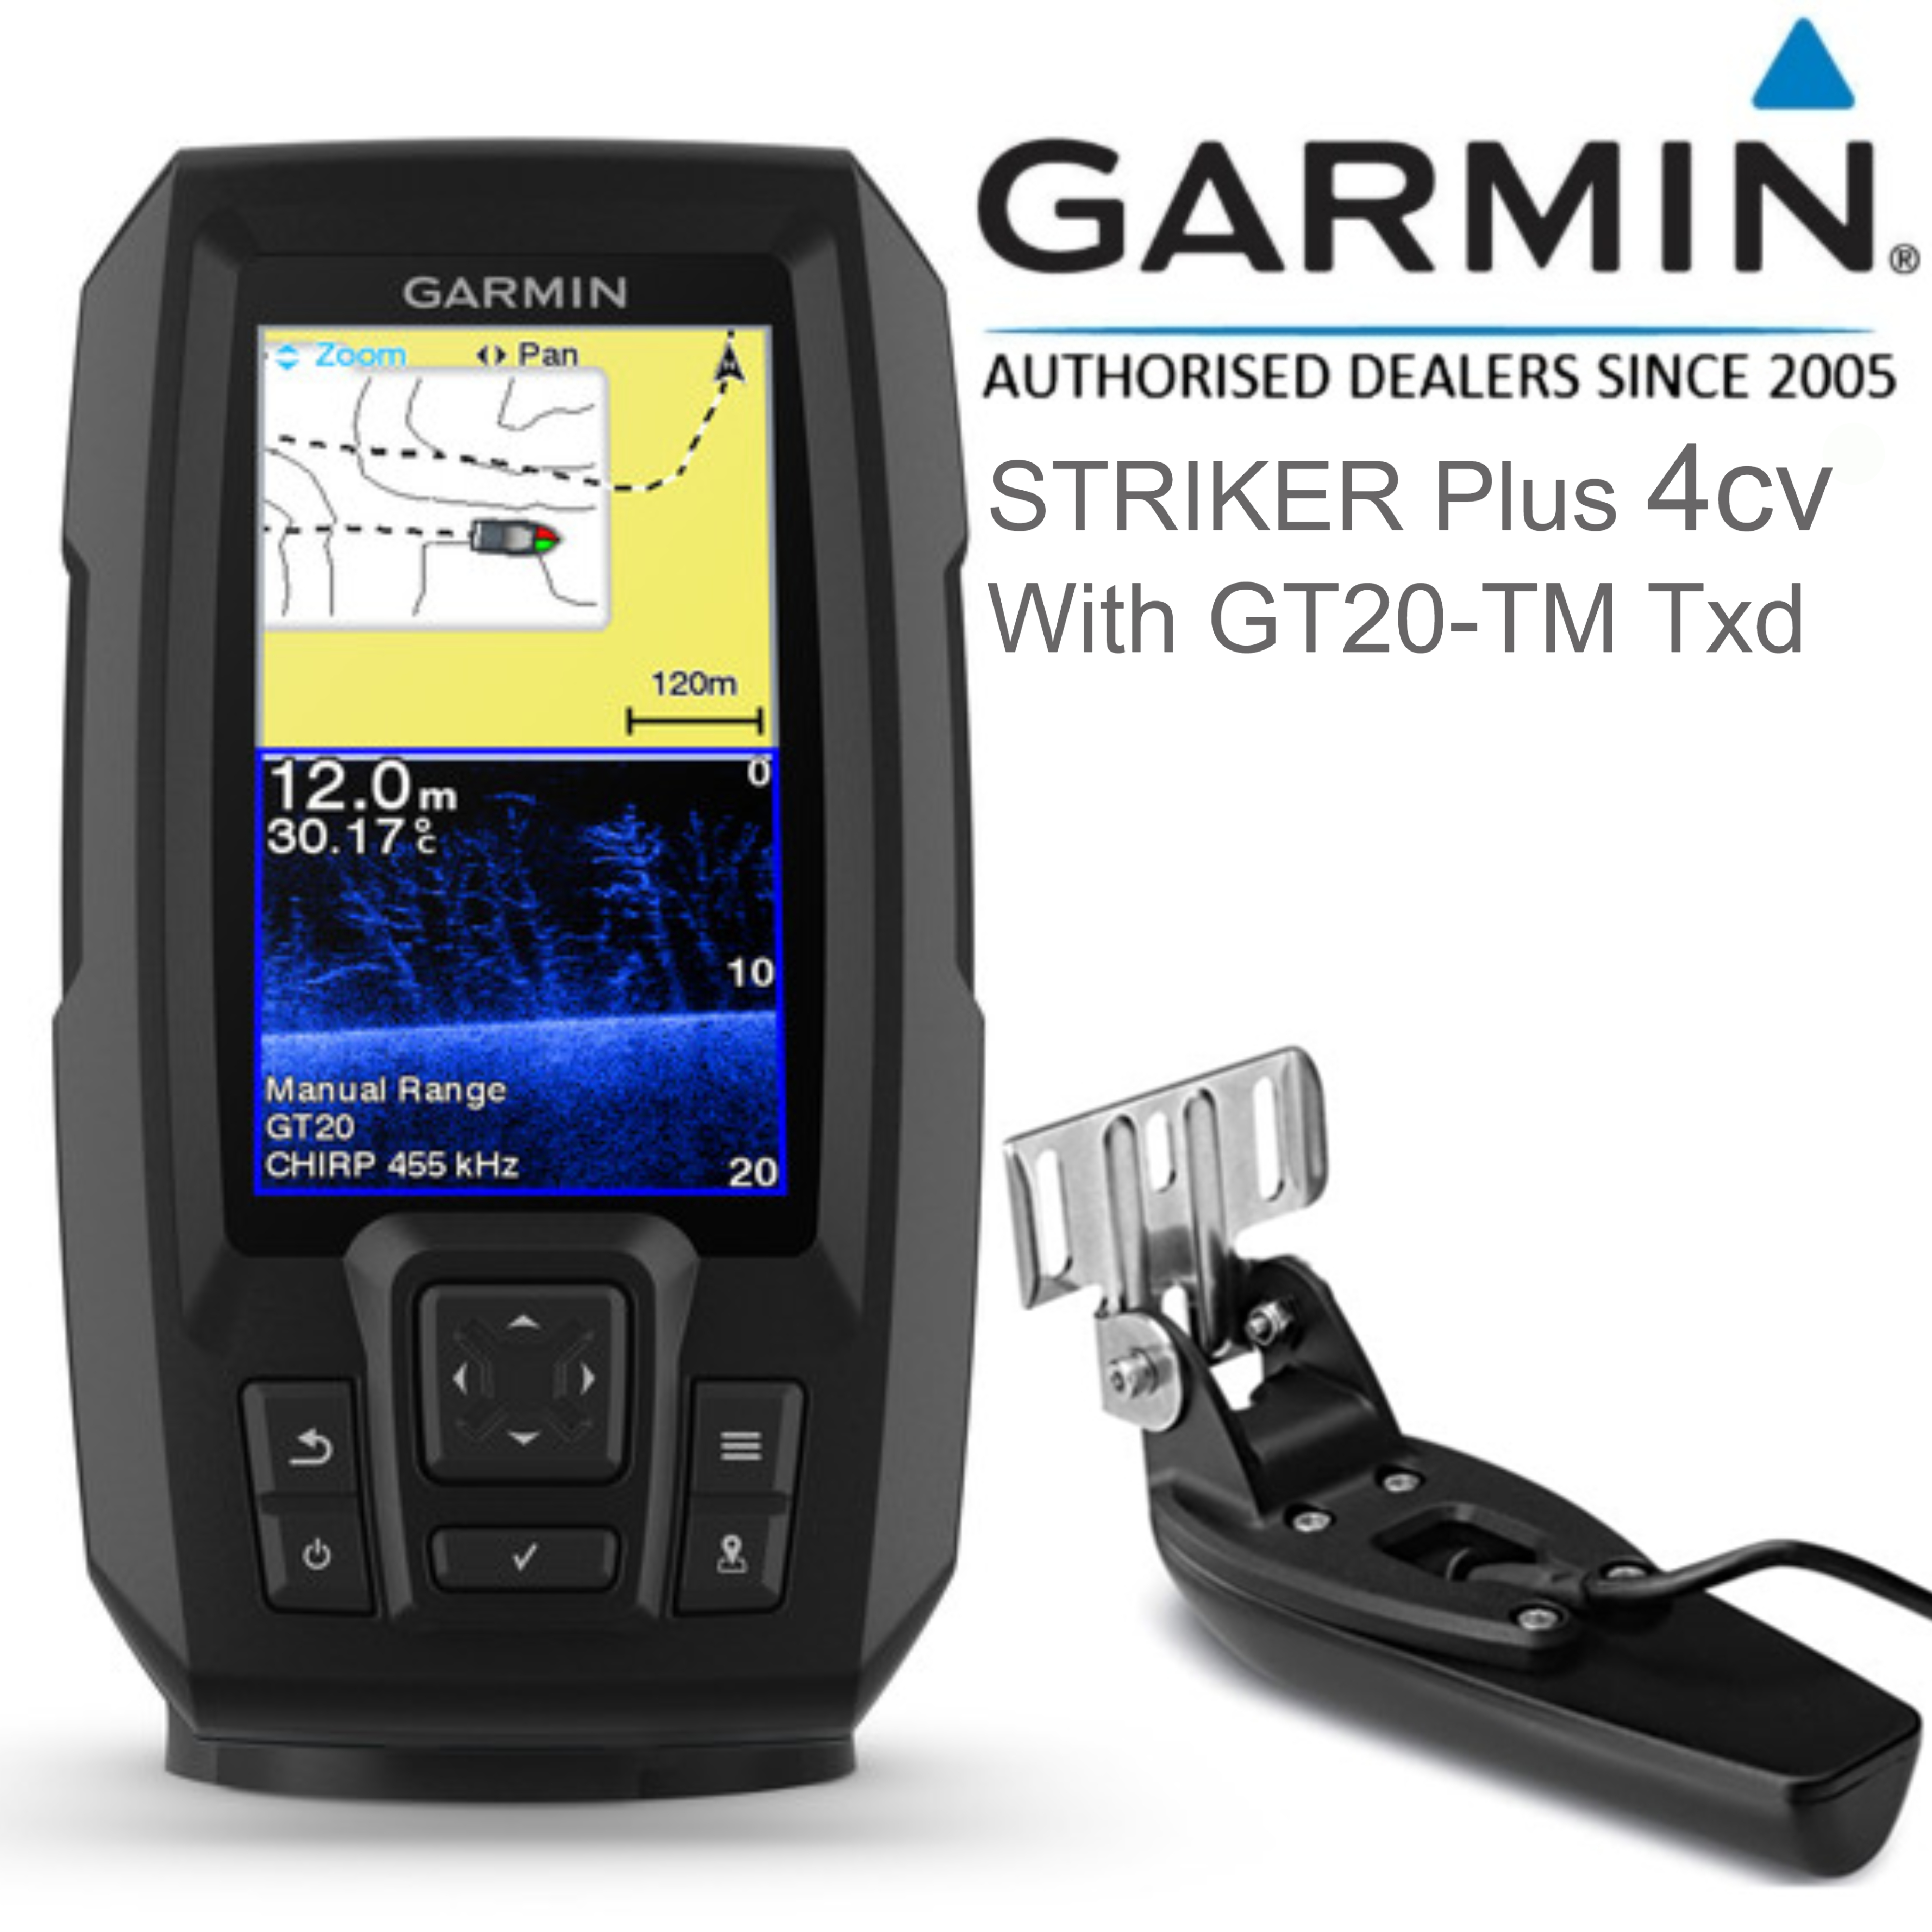 Garmin STRIKER Plus 4cv & GT20-TM Transom Transducer | GPS Fish Finder | IPX7 | For Marine